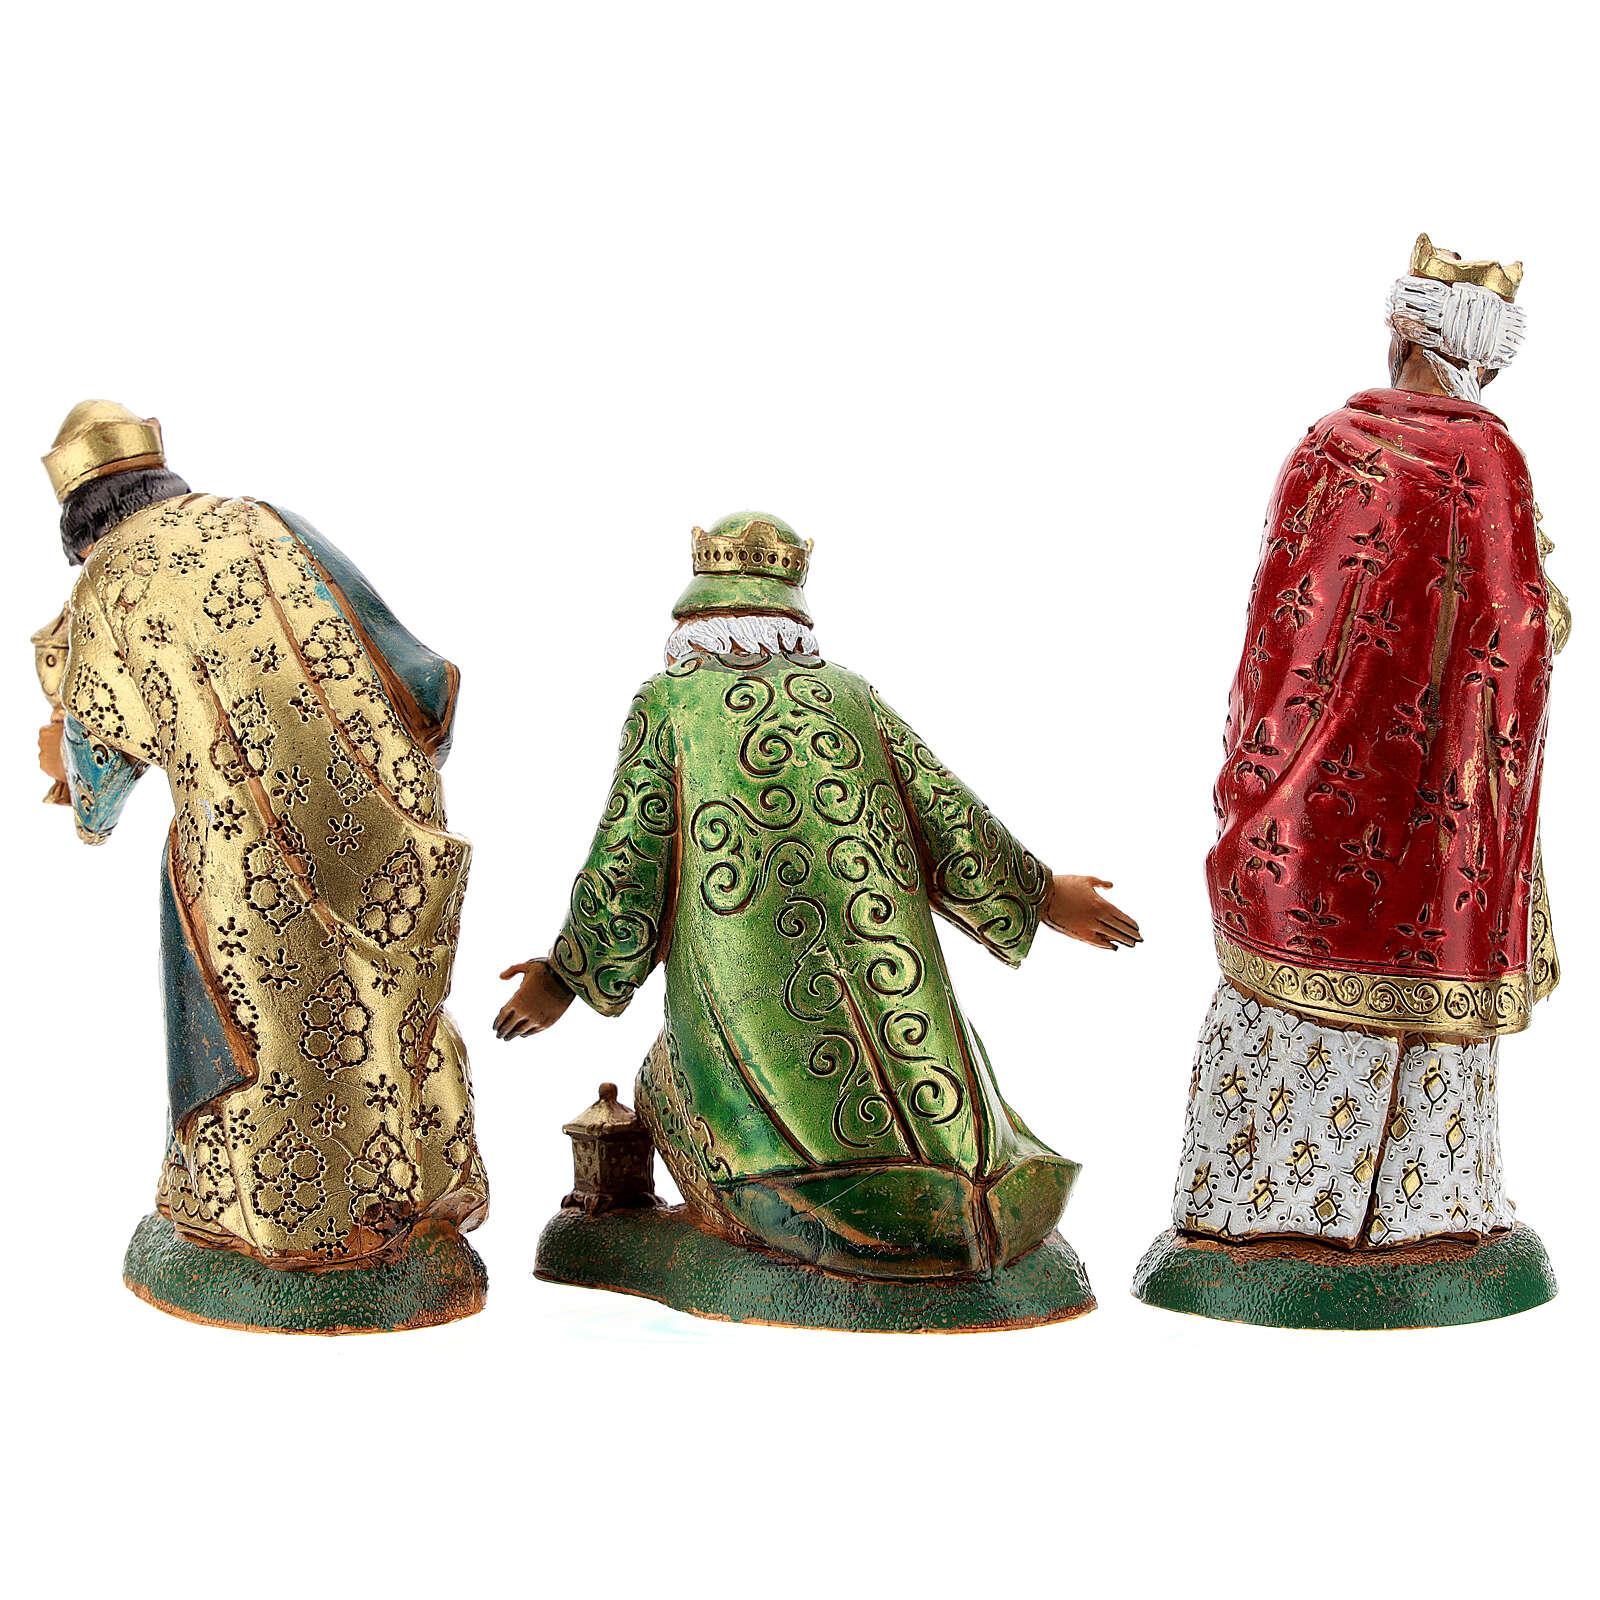 Wise men, 3 nativity figurines, 12cm Moranduzzo 4